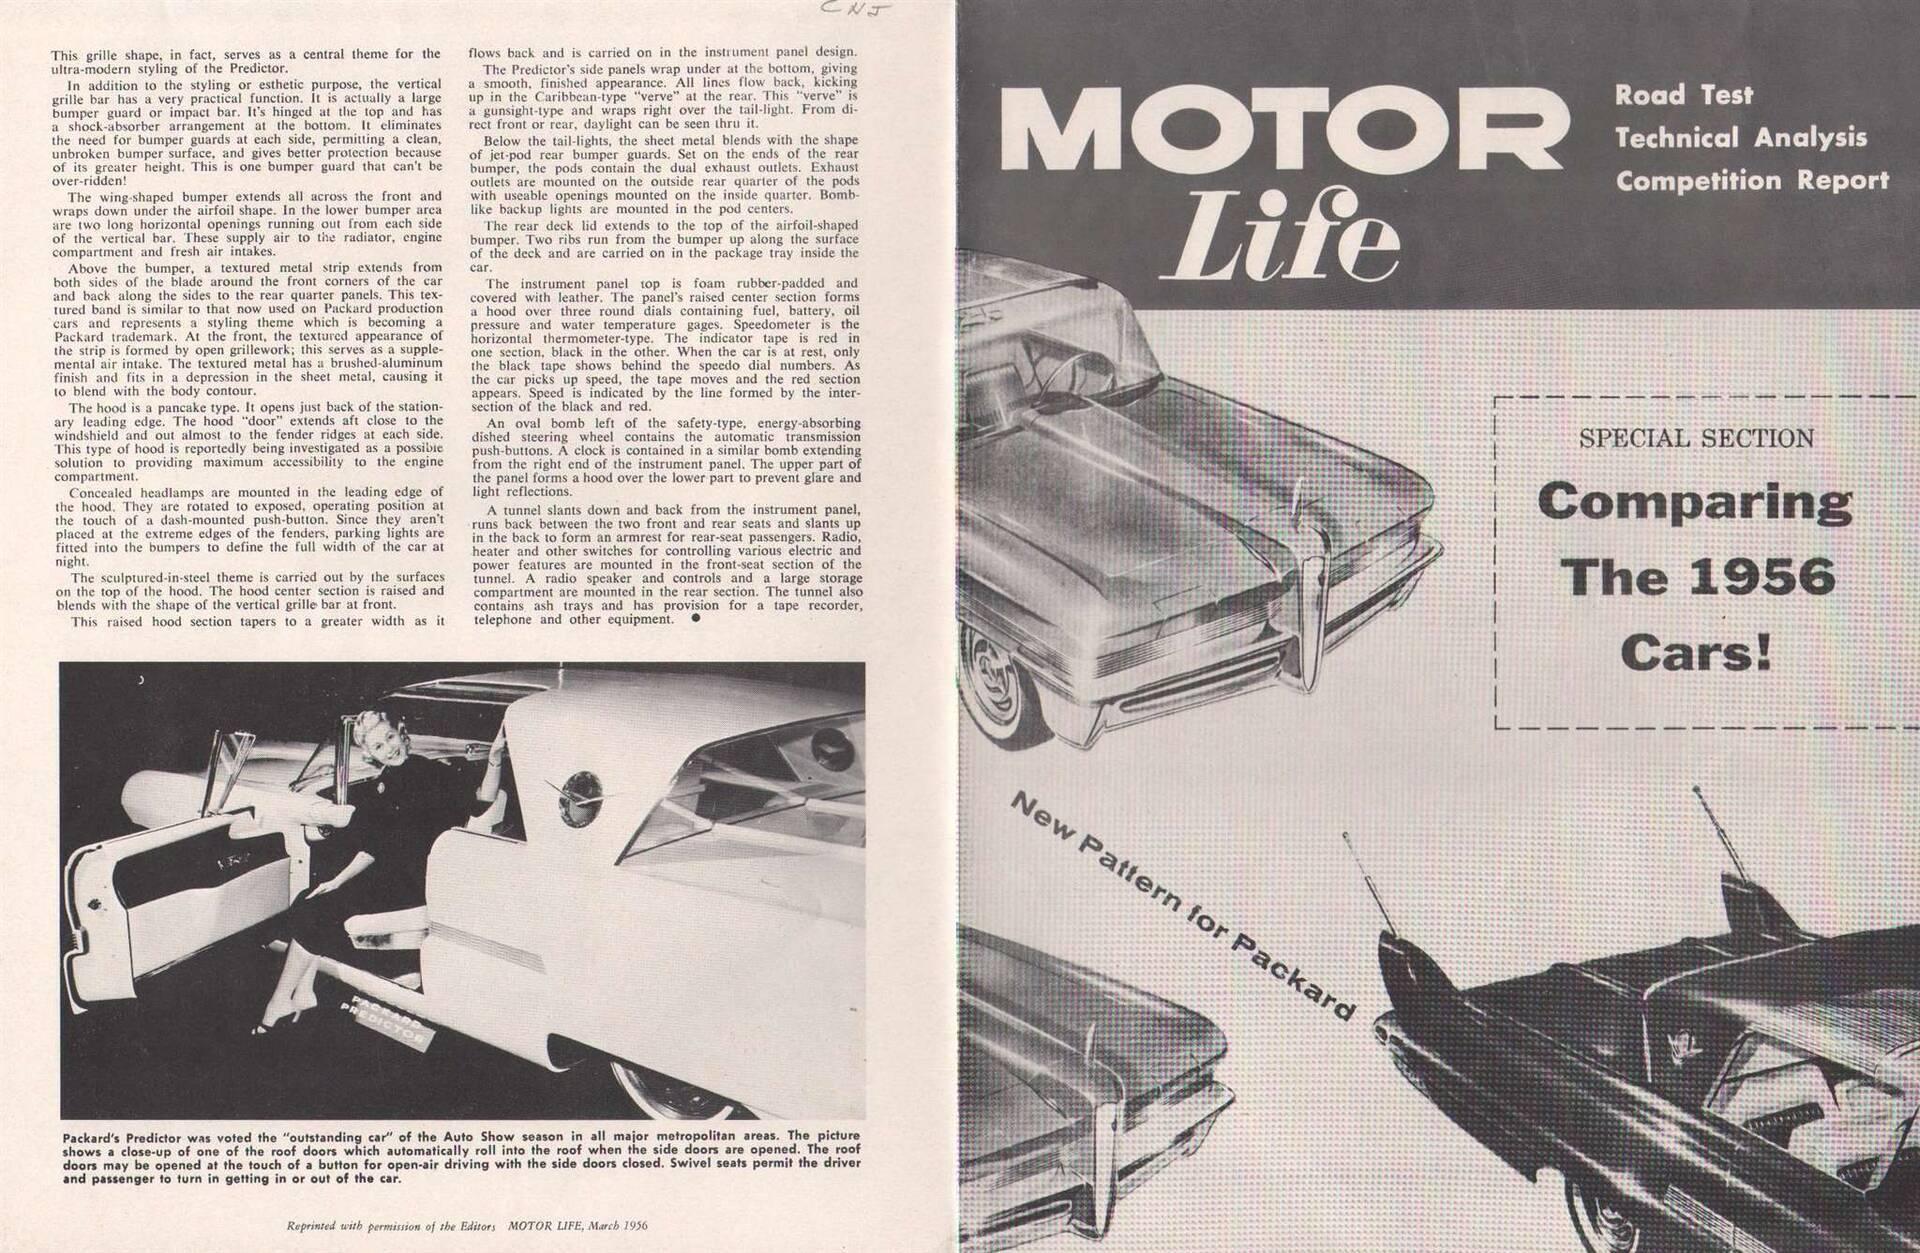 1956 Predictor